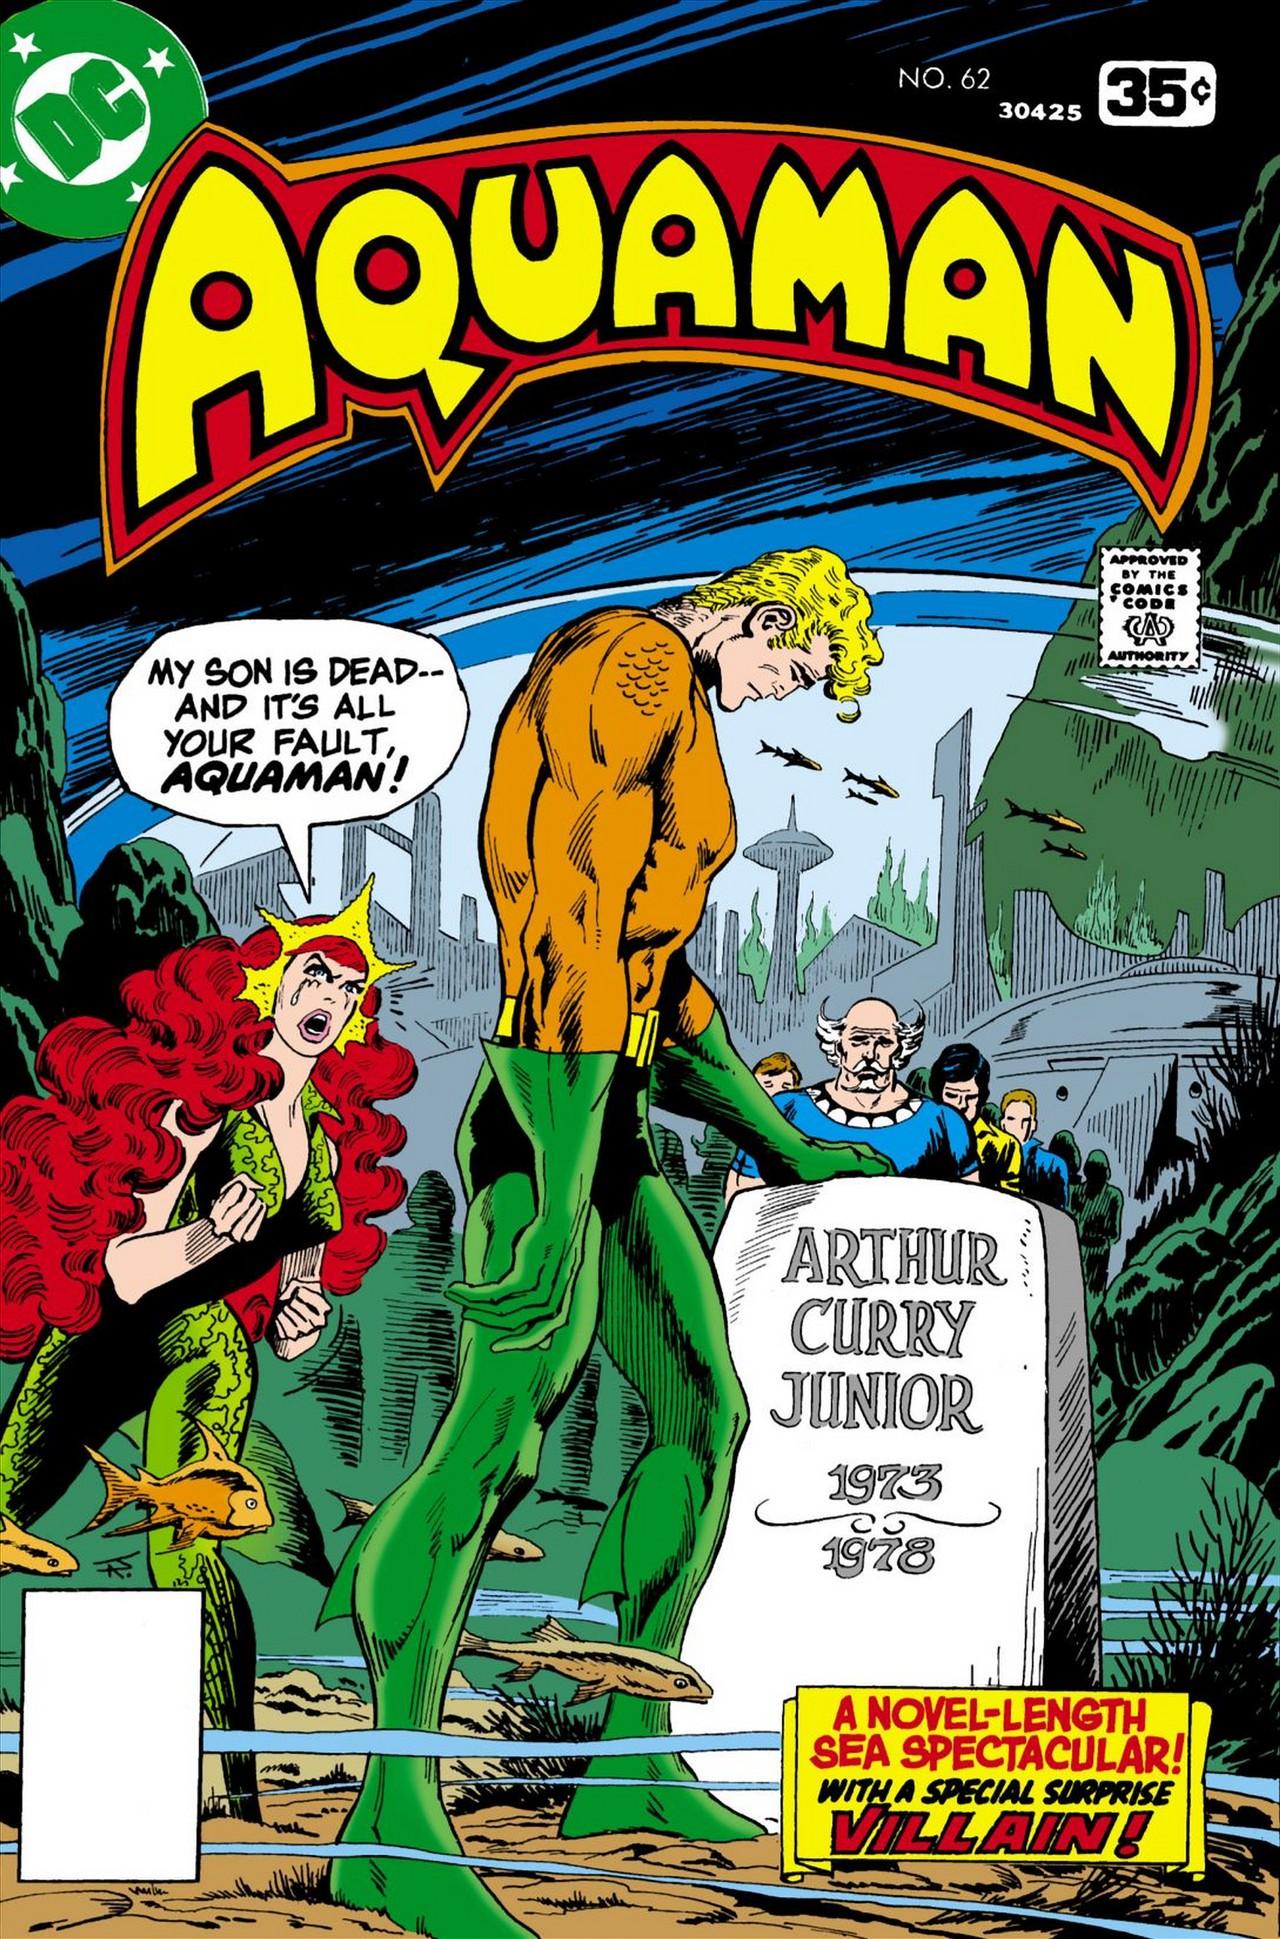 Read online Aquaman (1962) comic -  Issue #62 - 1